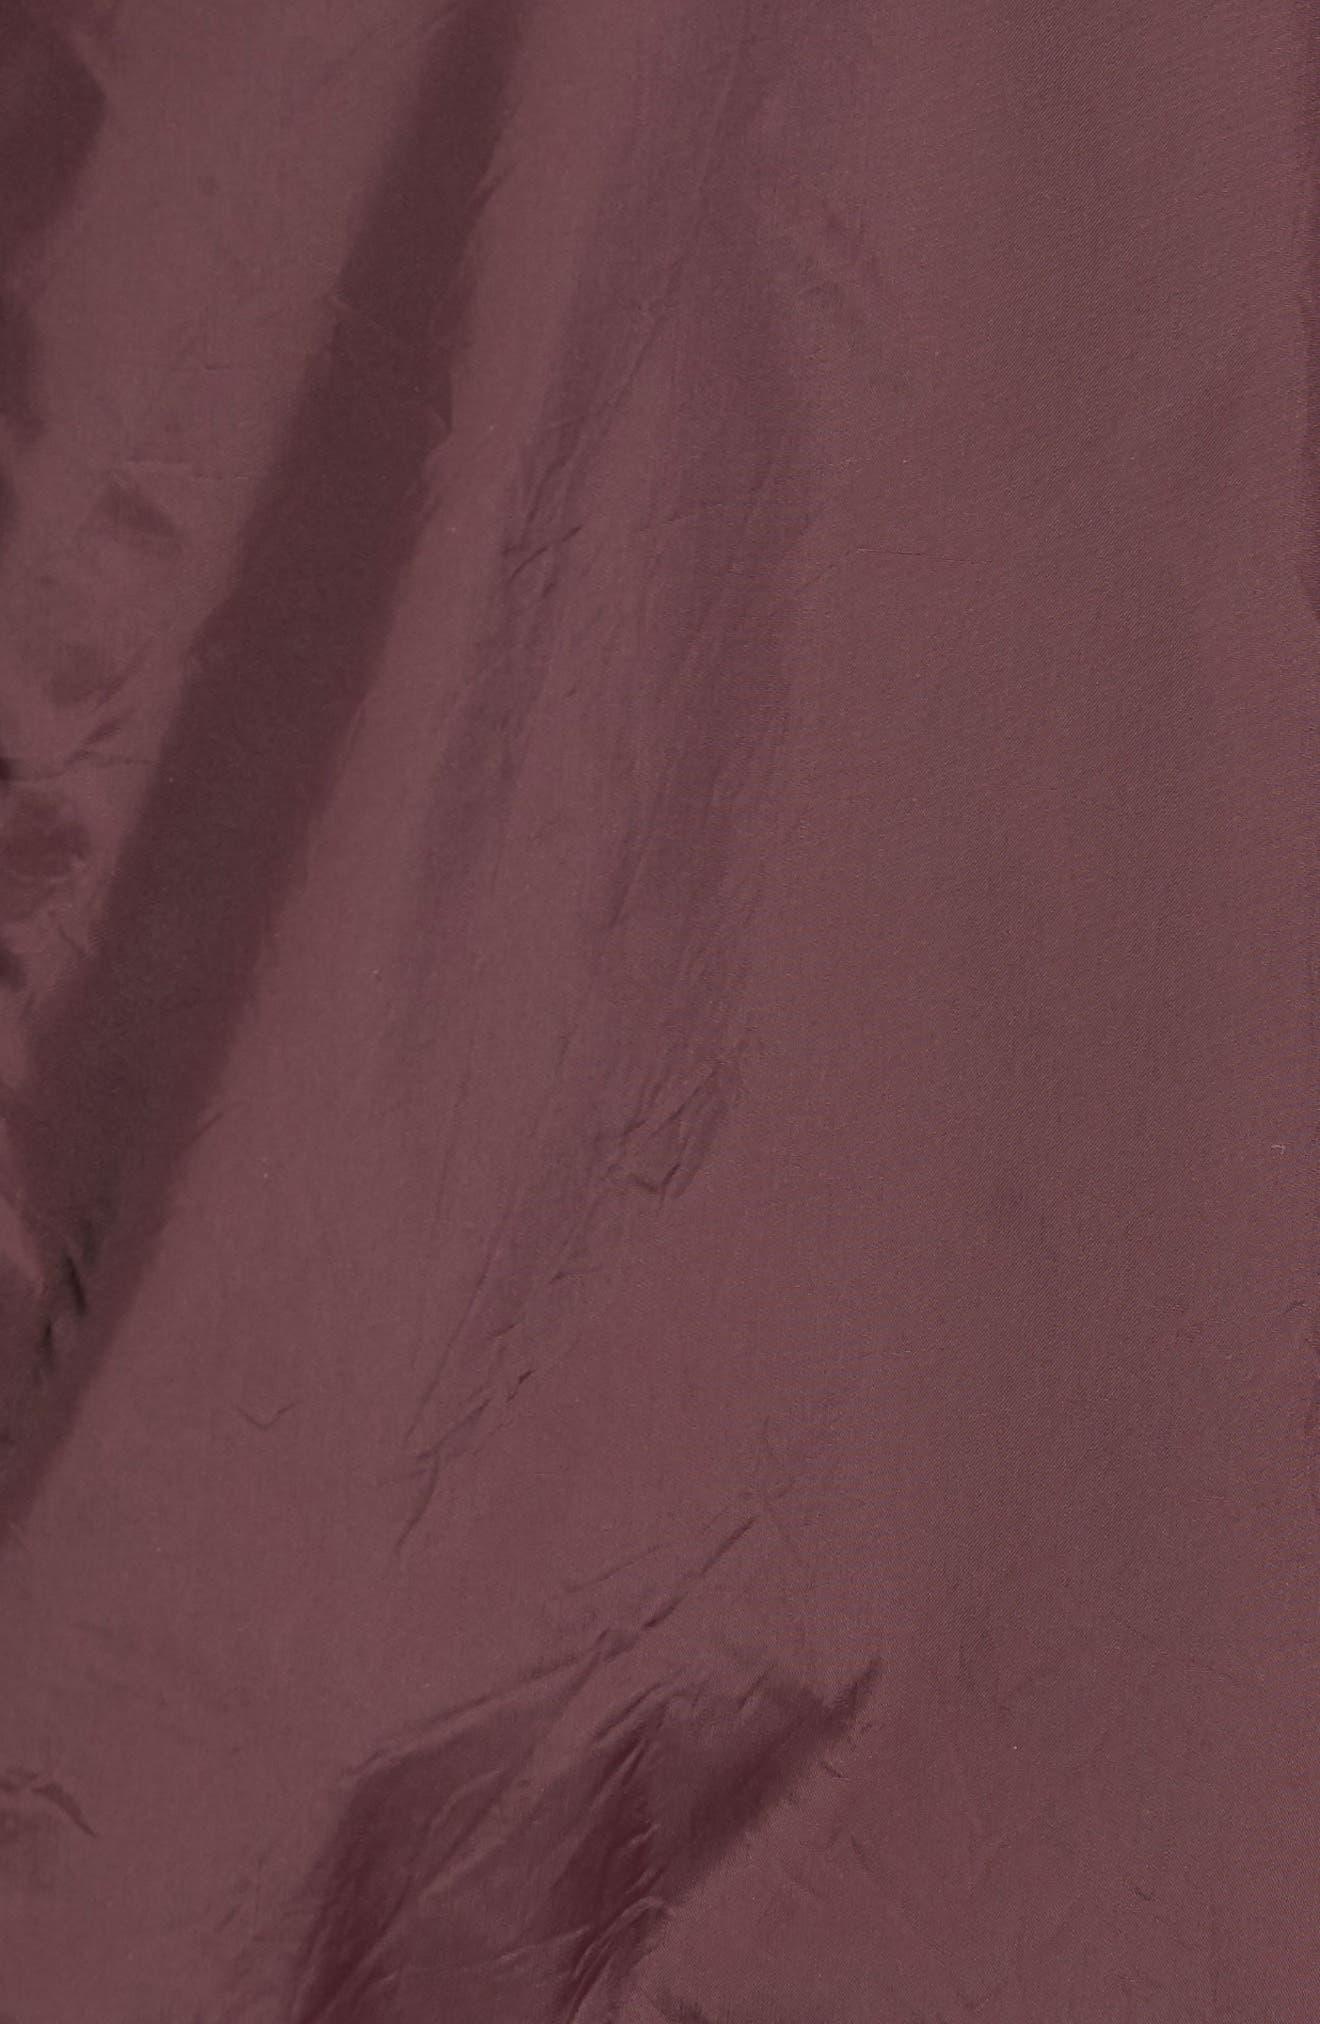 Slim Fit Bomber Jacket,                             Alternate thumbnail 5, color,                             Merlot